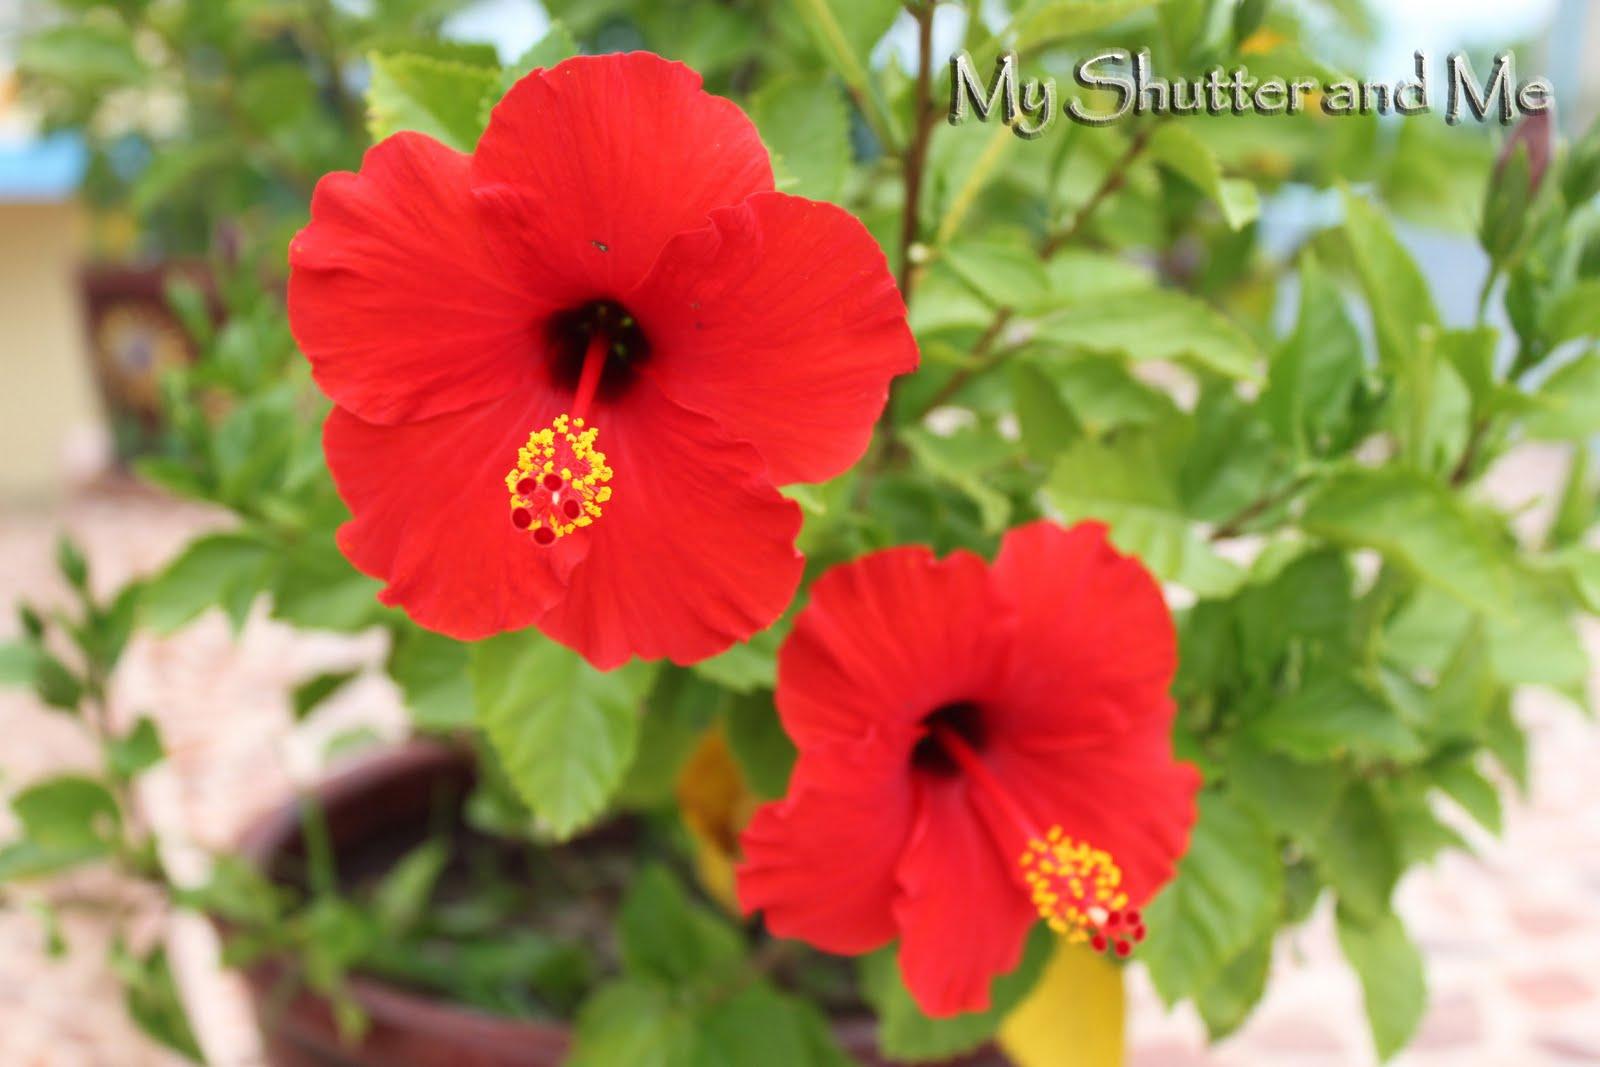 Jamaica national flower hibiscus image collections flower wallpaper hd my shutter and me hibiscus izmirmasajfo izmirmasajfo